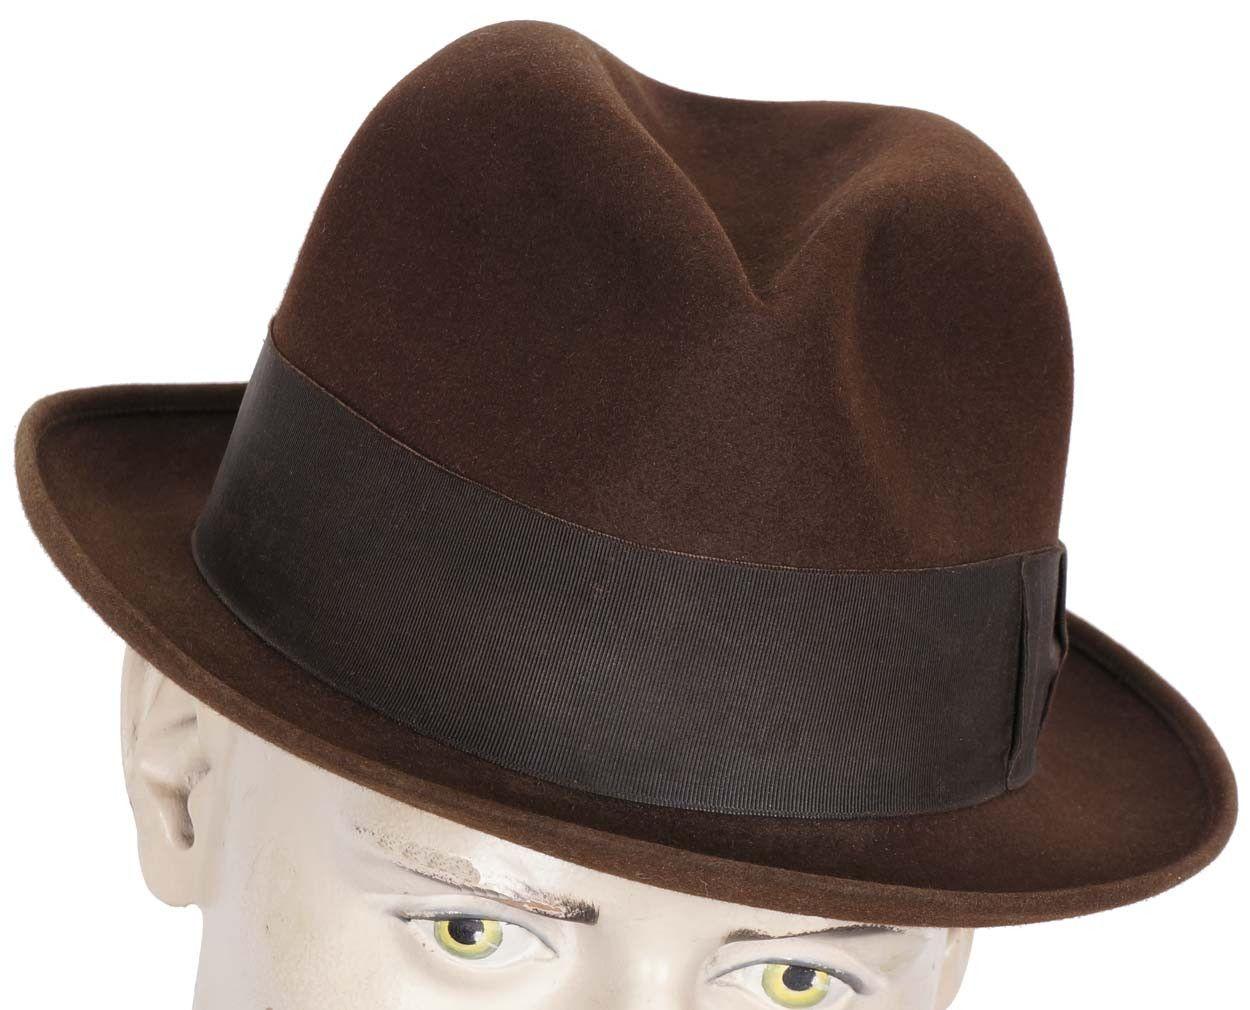 9c715233a1c Vintage Borsalino Brown Fedora Hat Mens Size Large 7 1/4 | His ...